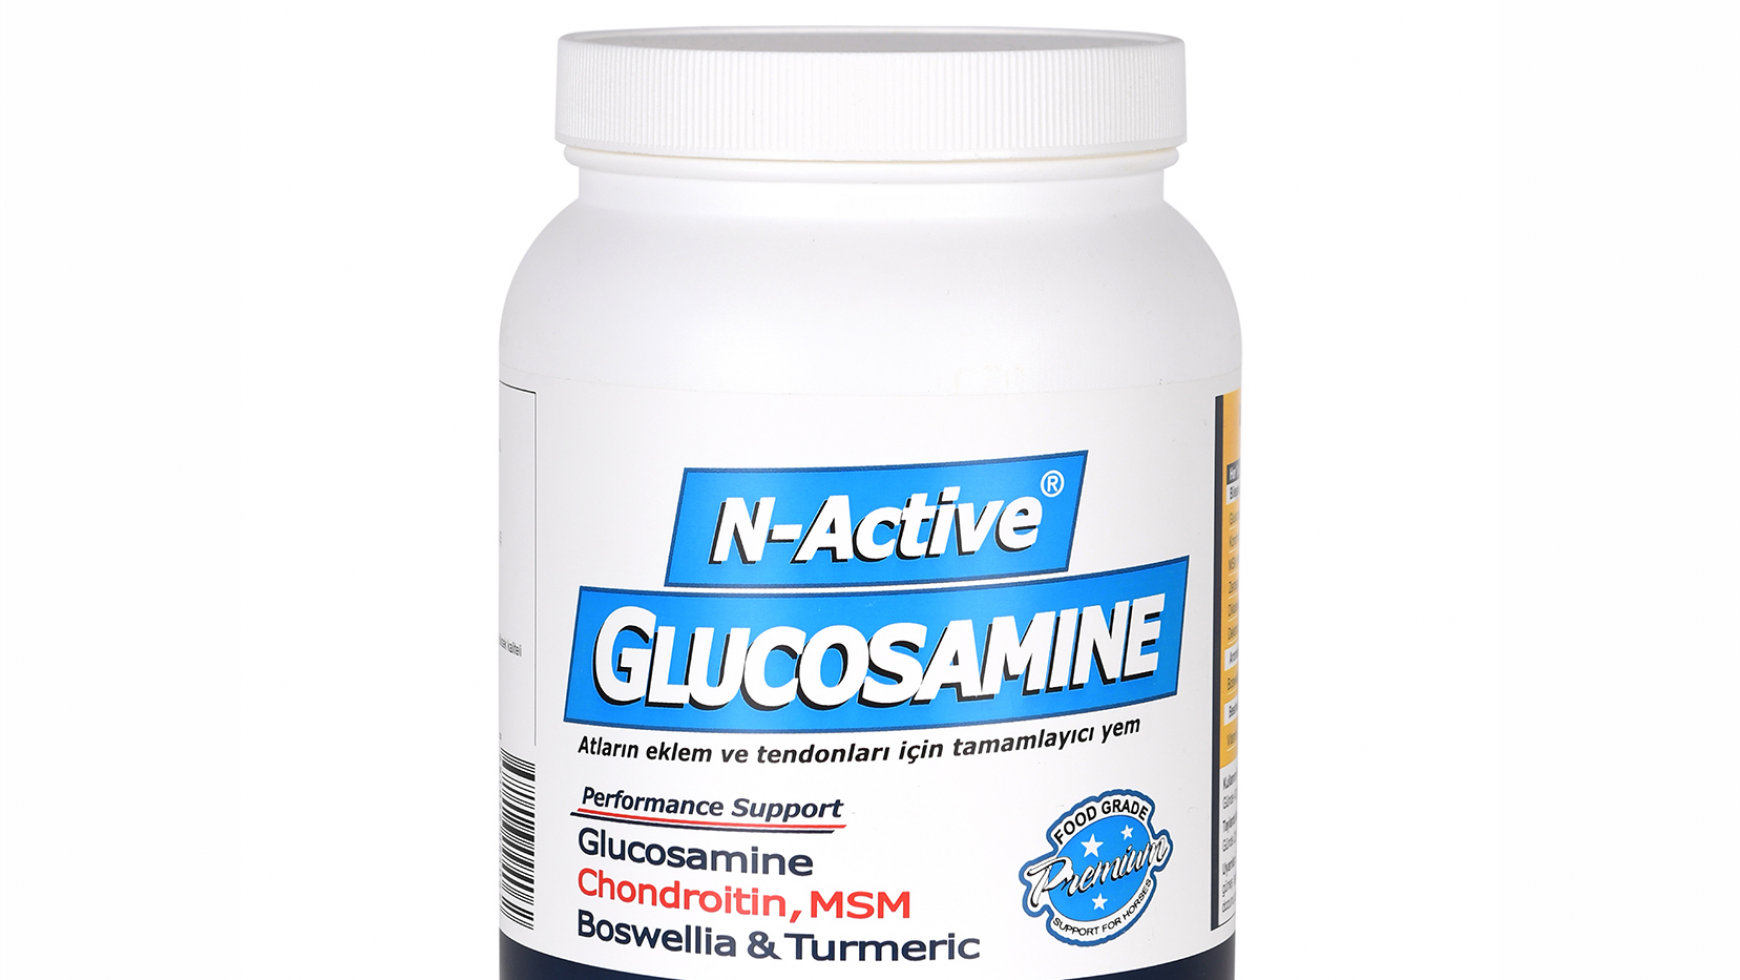 N-ACTIVE GLUCOSAMINE